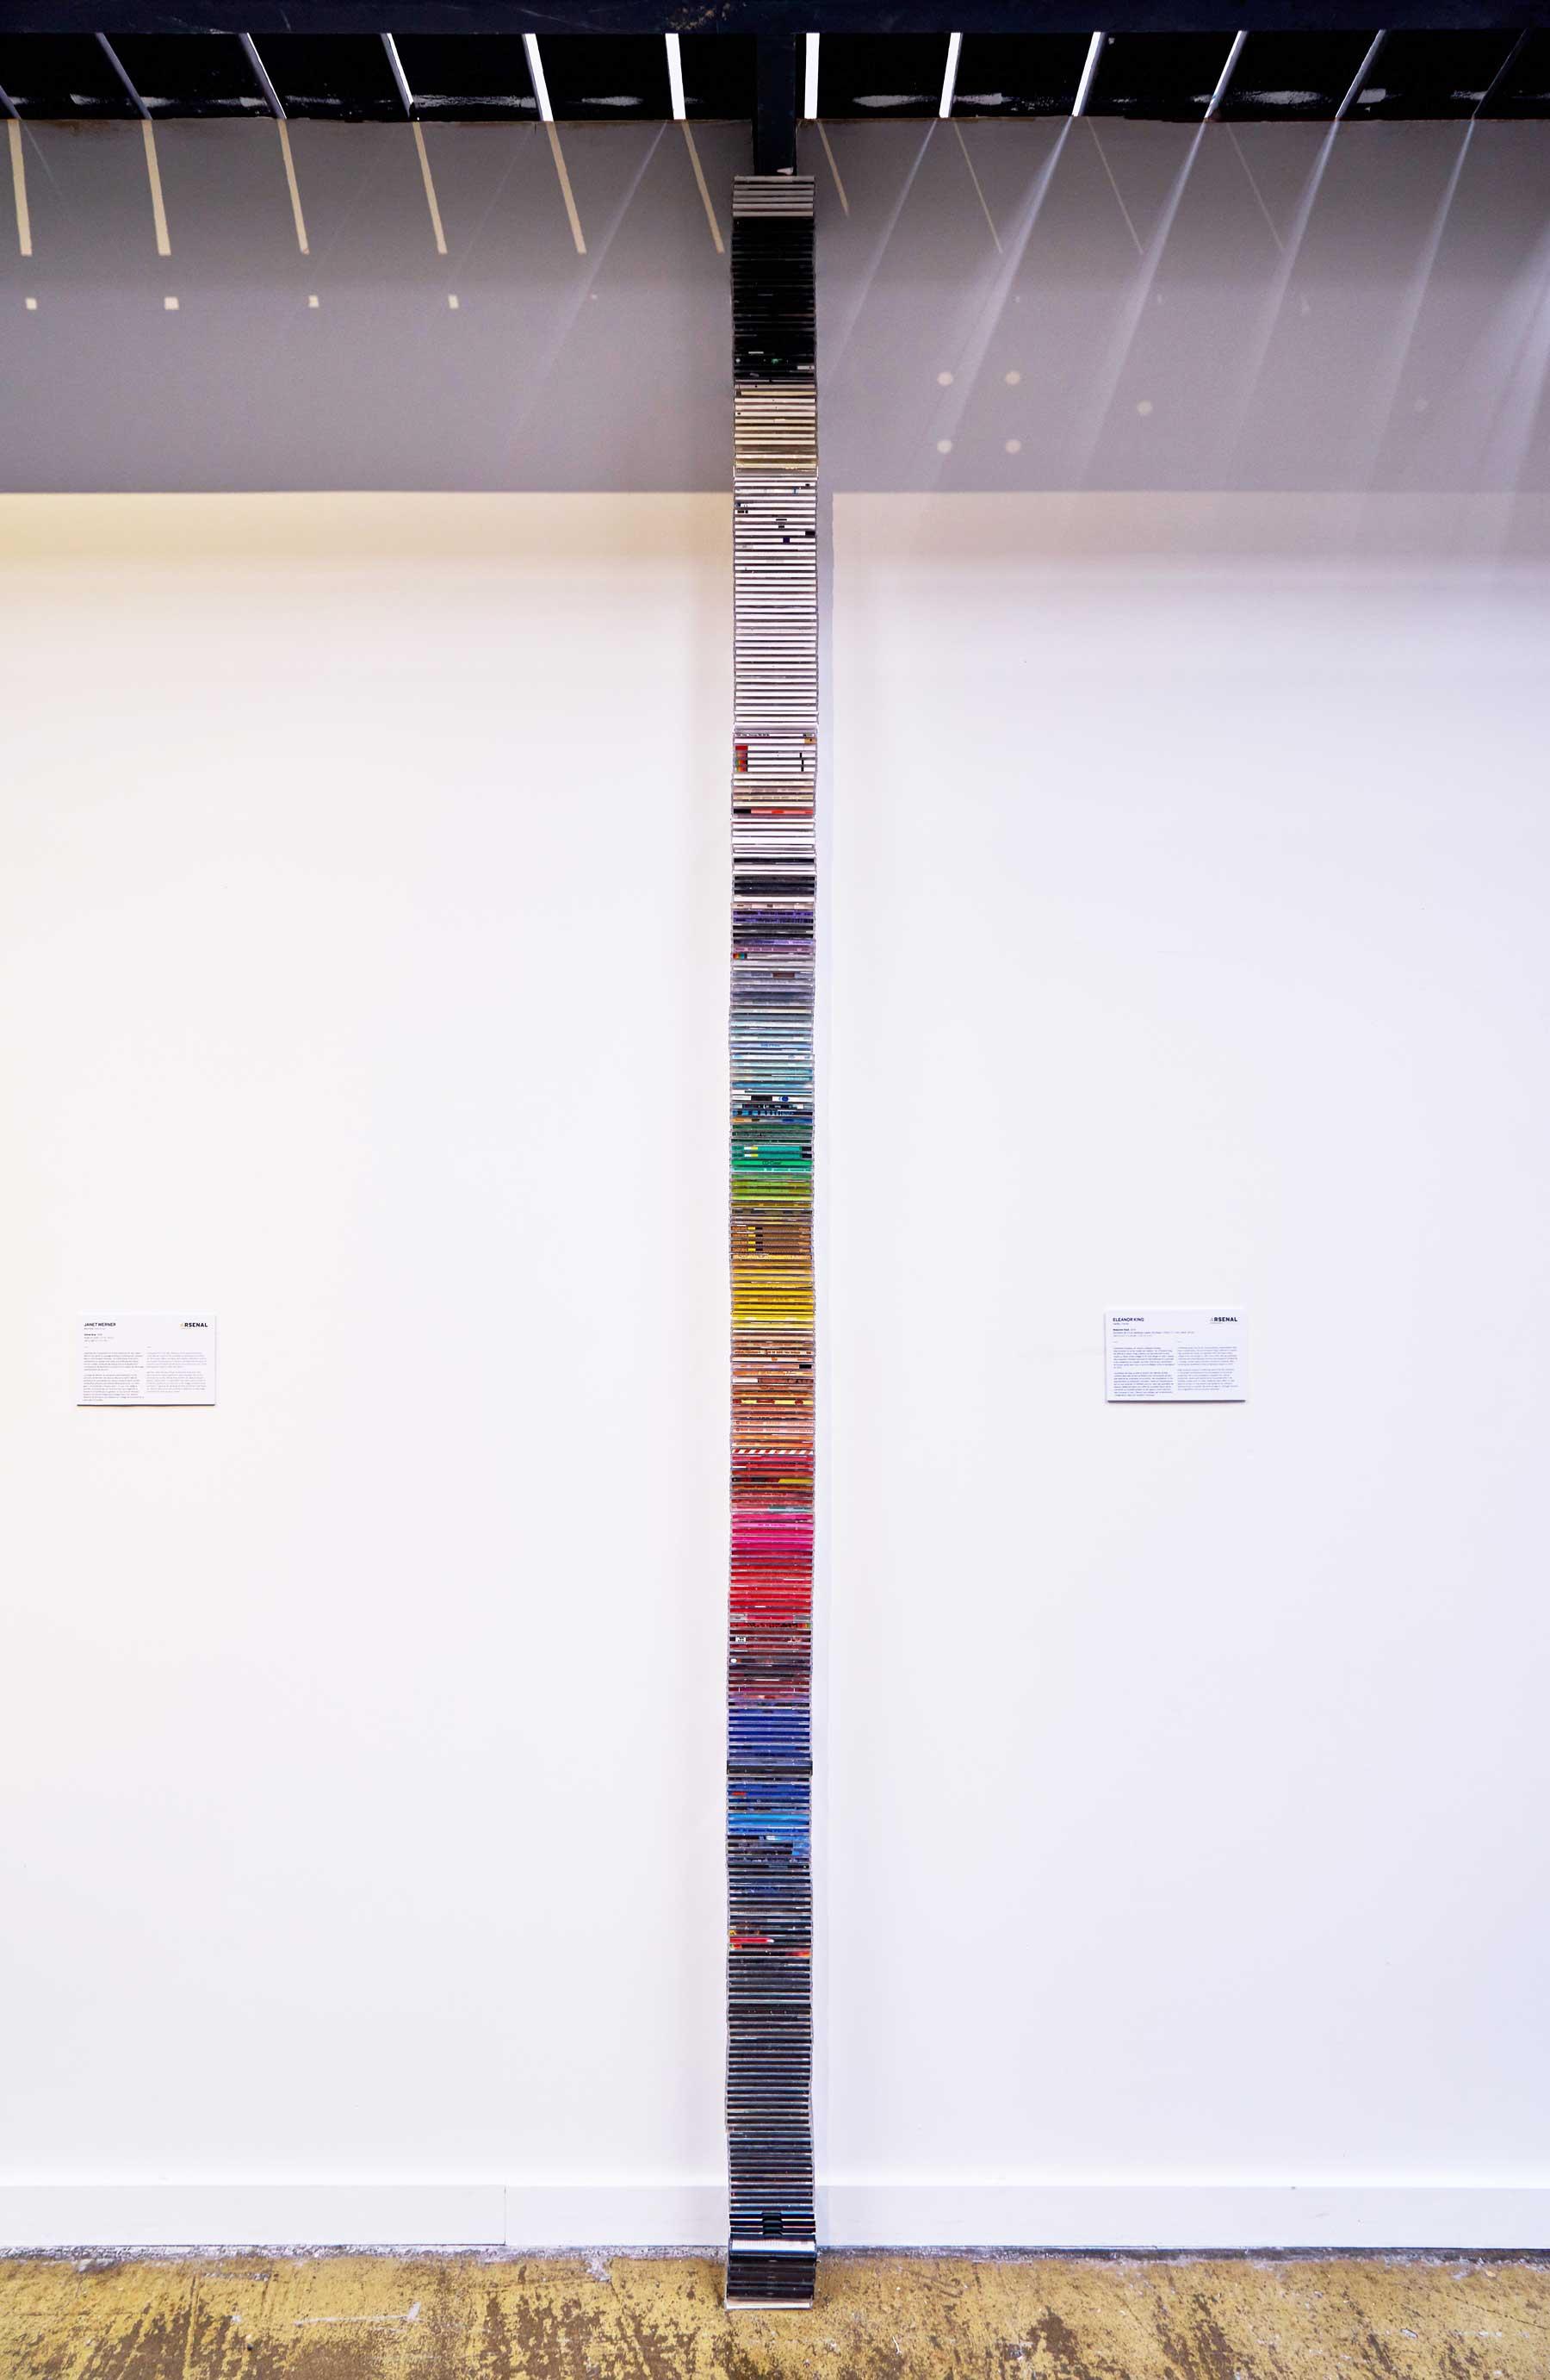 "Eleanor King ,  Redacted Stack , 2014, Plastic CD cases, paper, acrylic, 132"" x 5"" x 4 1/2"" (335,3 x 12,7 x 11,4 cm)"